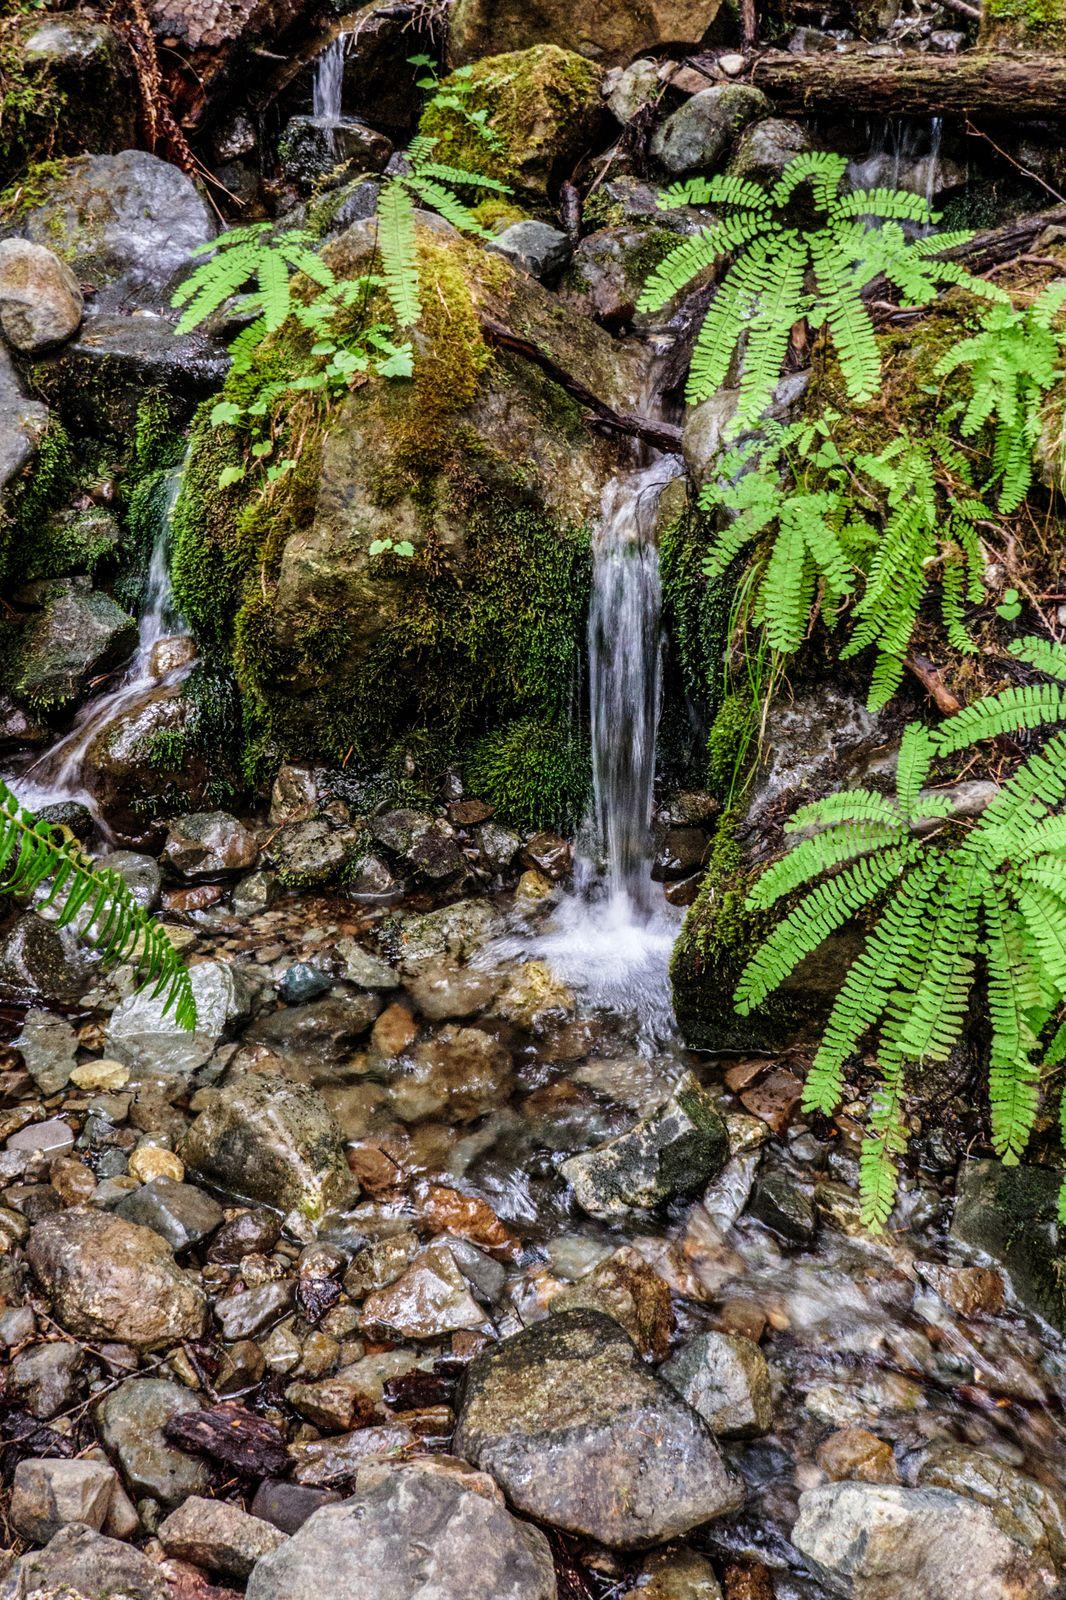 A little waterfall along the way